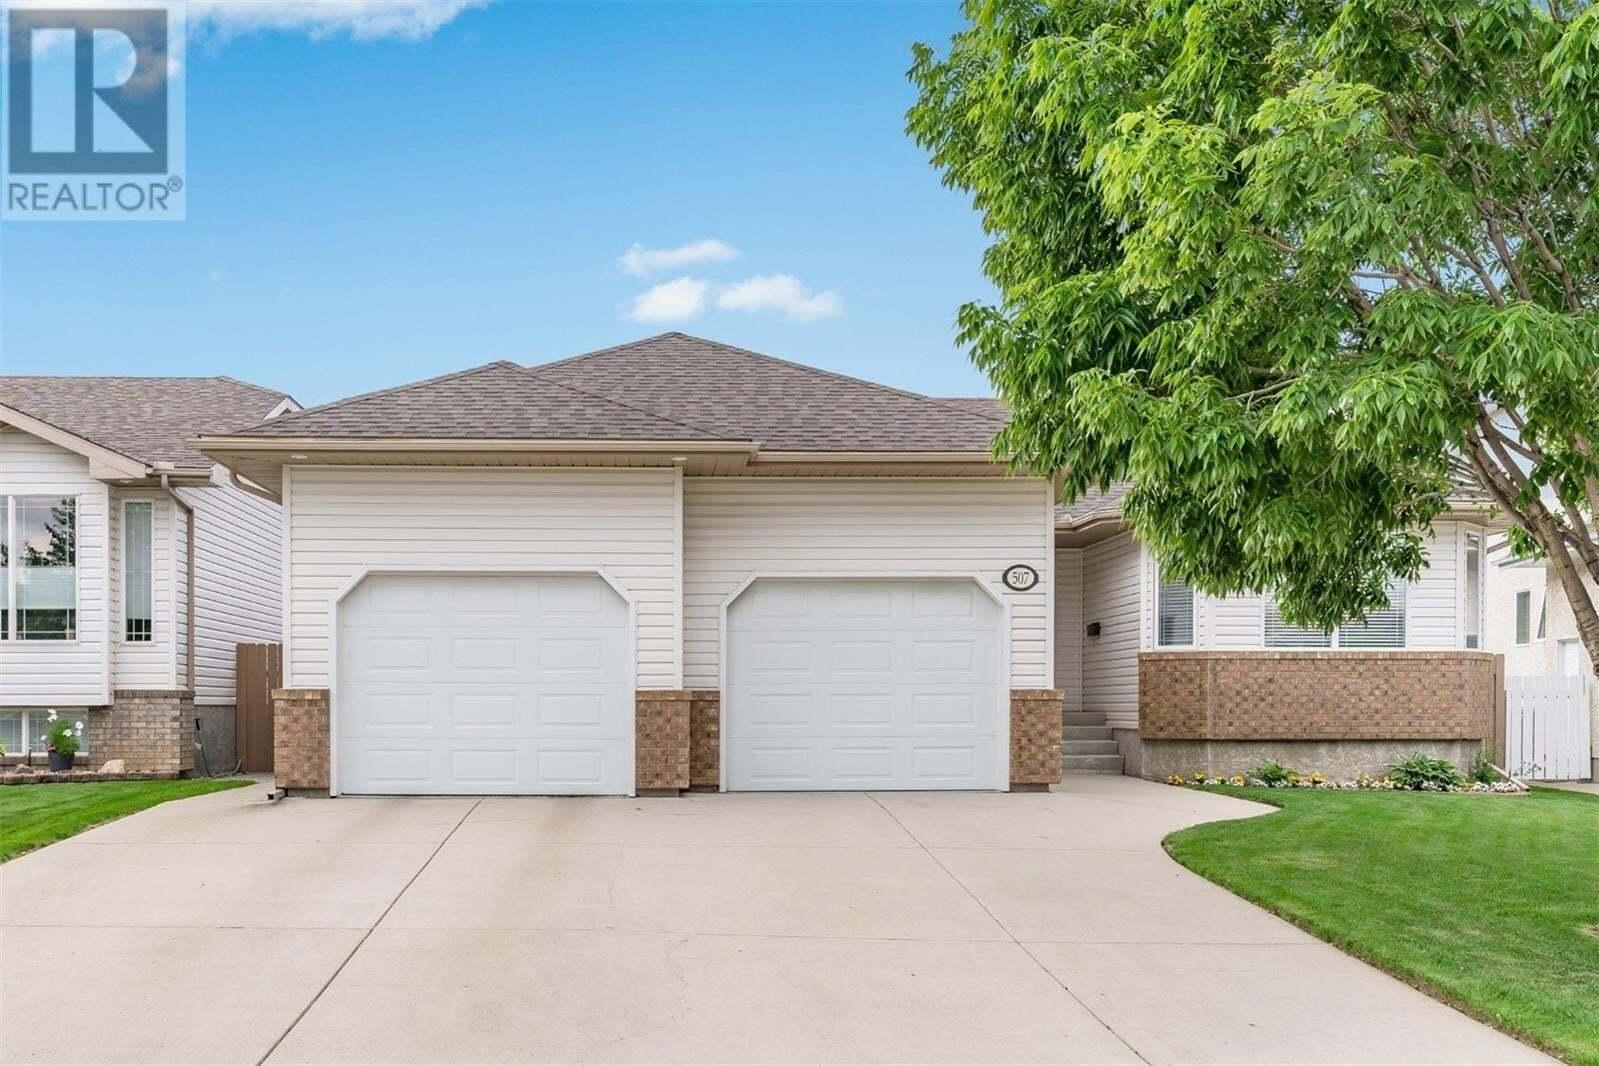 House for sale at 507 Beerling Cres Saskatoon Saskatchewan - MLS: SK817123